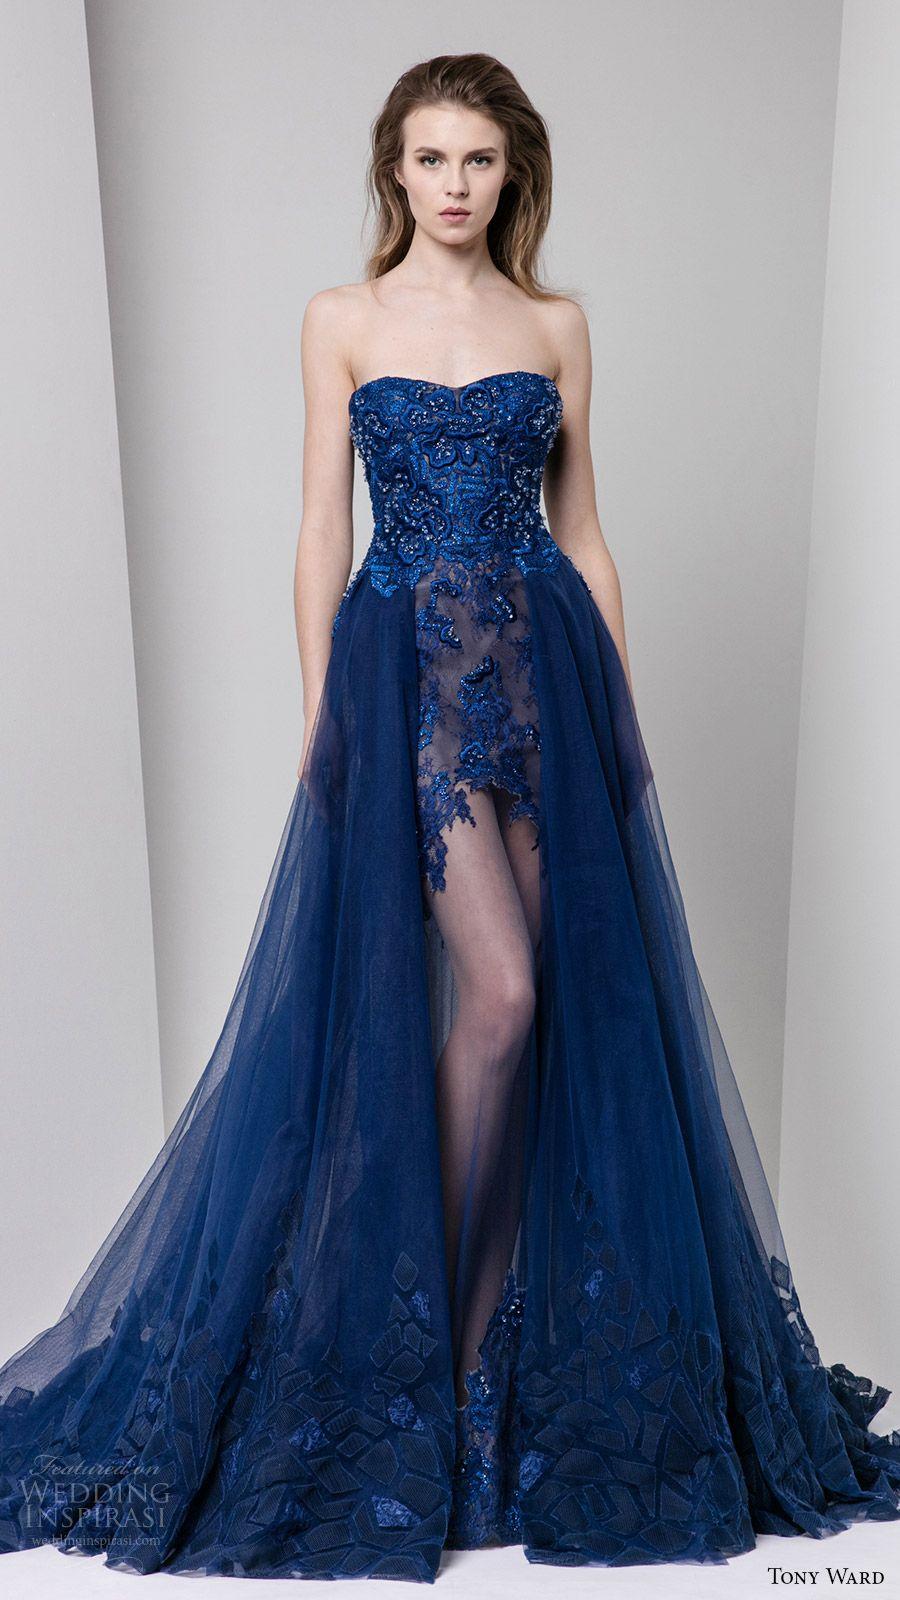 f02c1cd6de4f0 tony ward fall winter 2016 2017 rtw strapless semi sweetheart embellished  bodice a line evening dress illusion skirt overskirt blue color